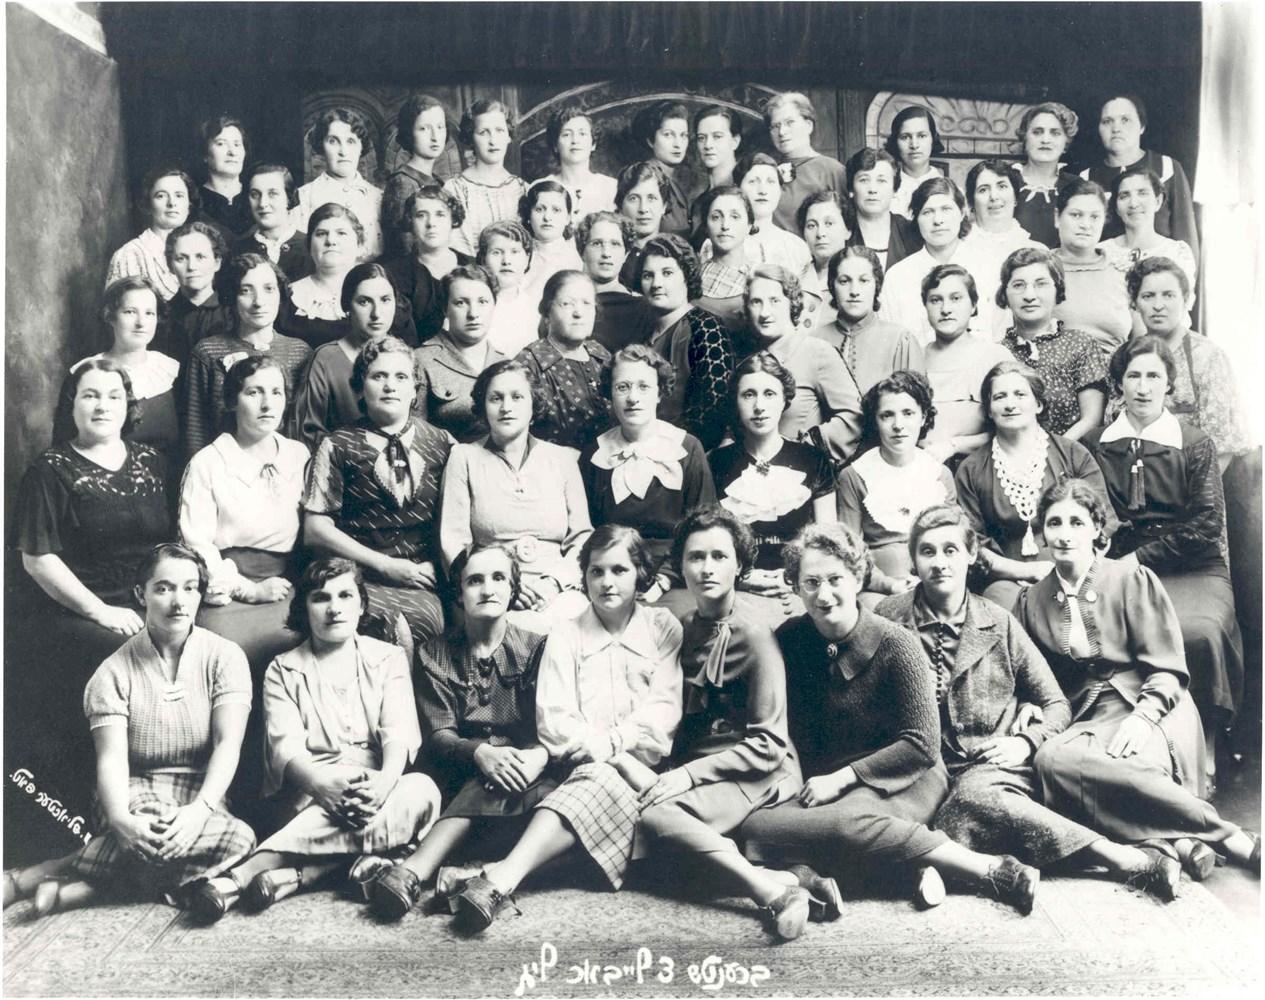 ontario jewish single women Rating of beautiful jewish women (israeli women)  toronto, ontario, canada, for her father was jewish) - canadian actress and social activist 25 donna feldman.